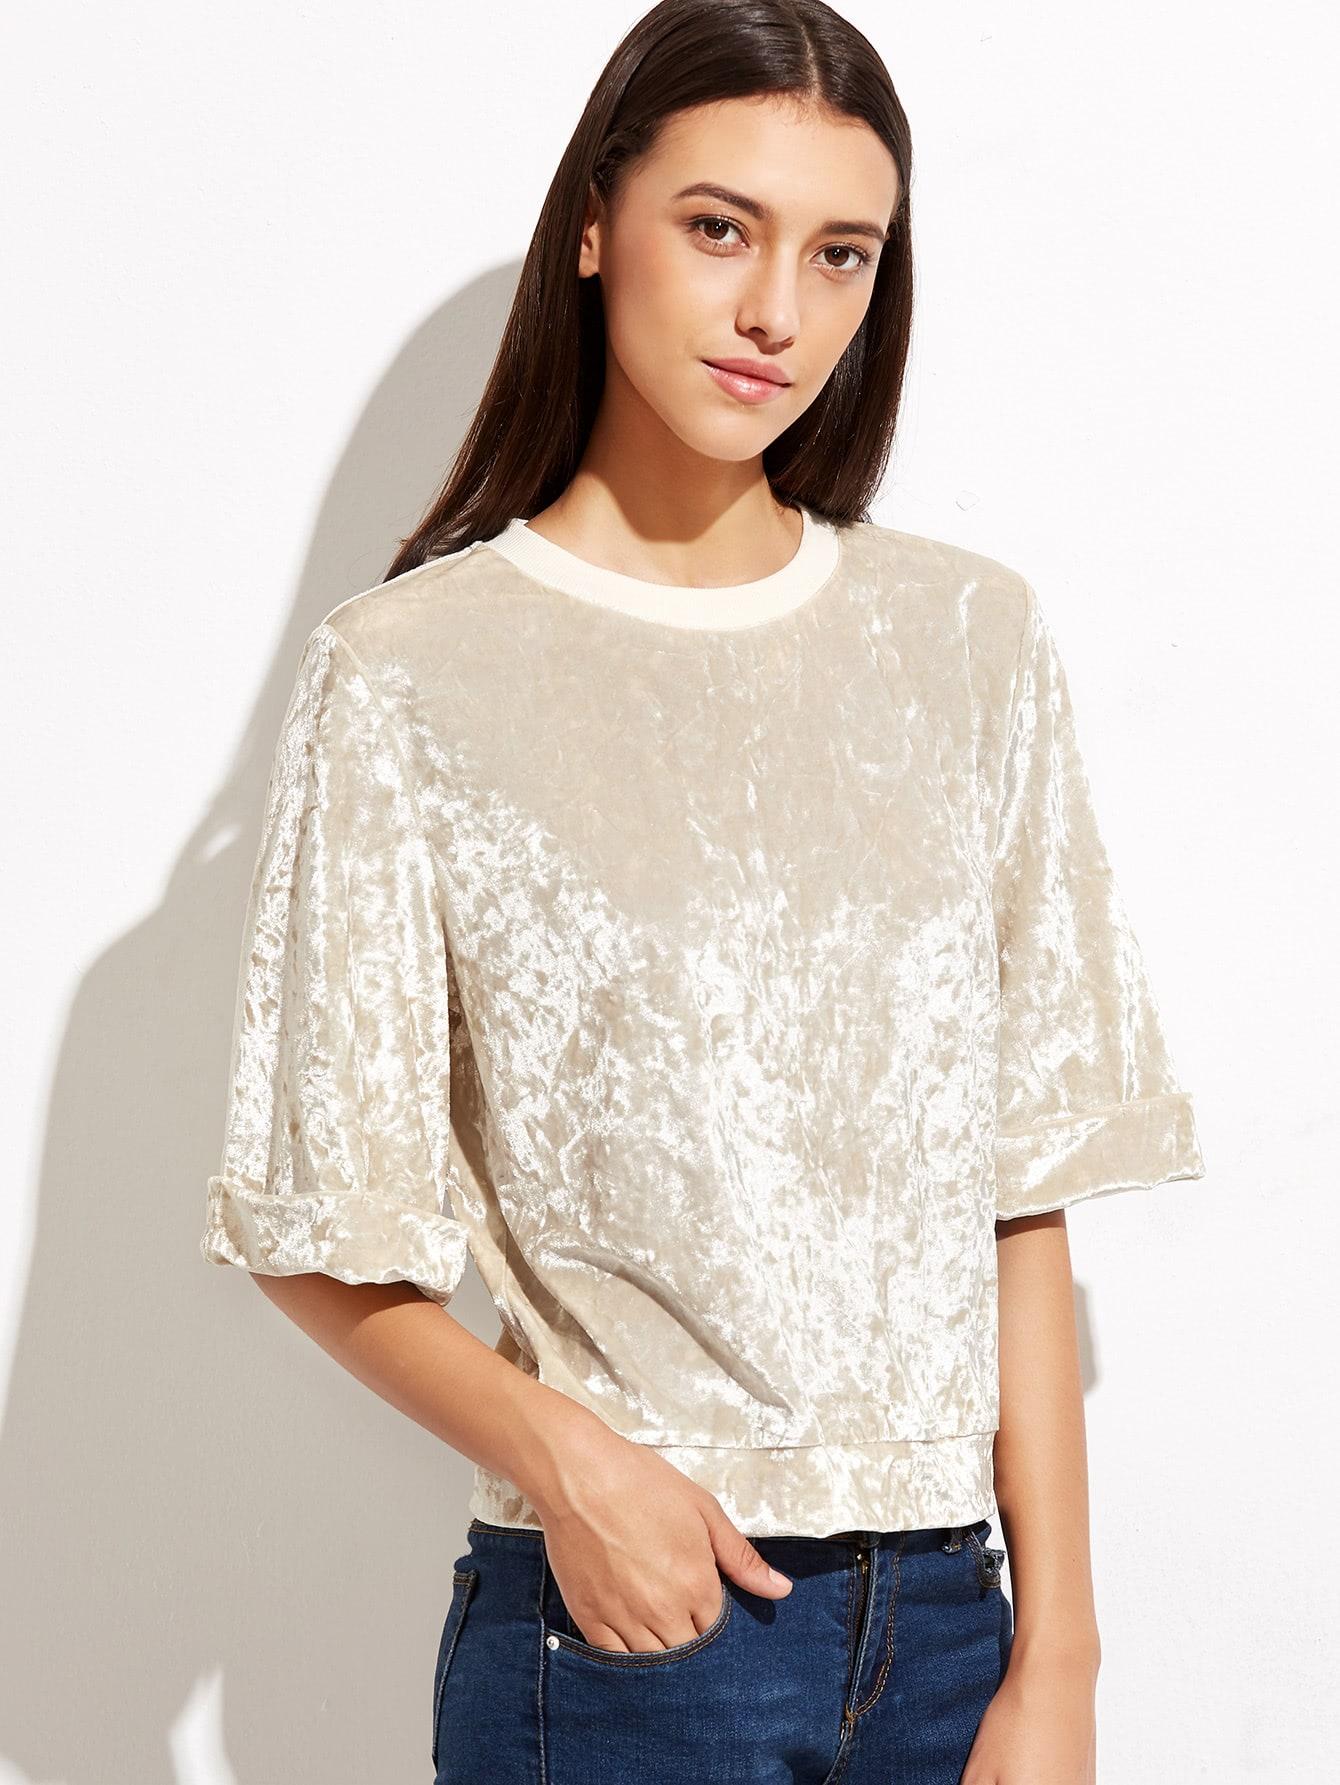 blouse160923710_2